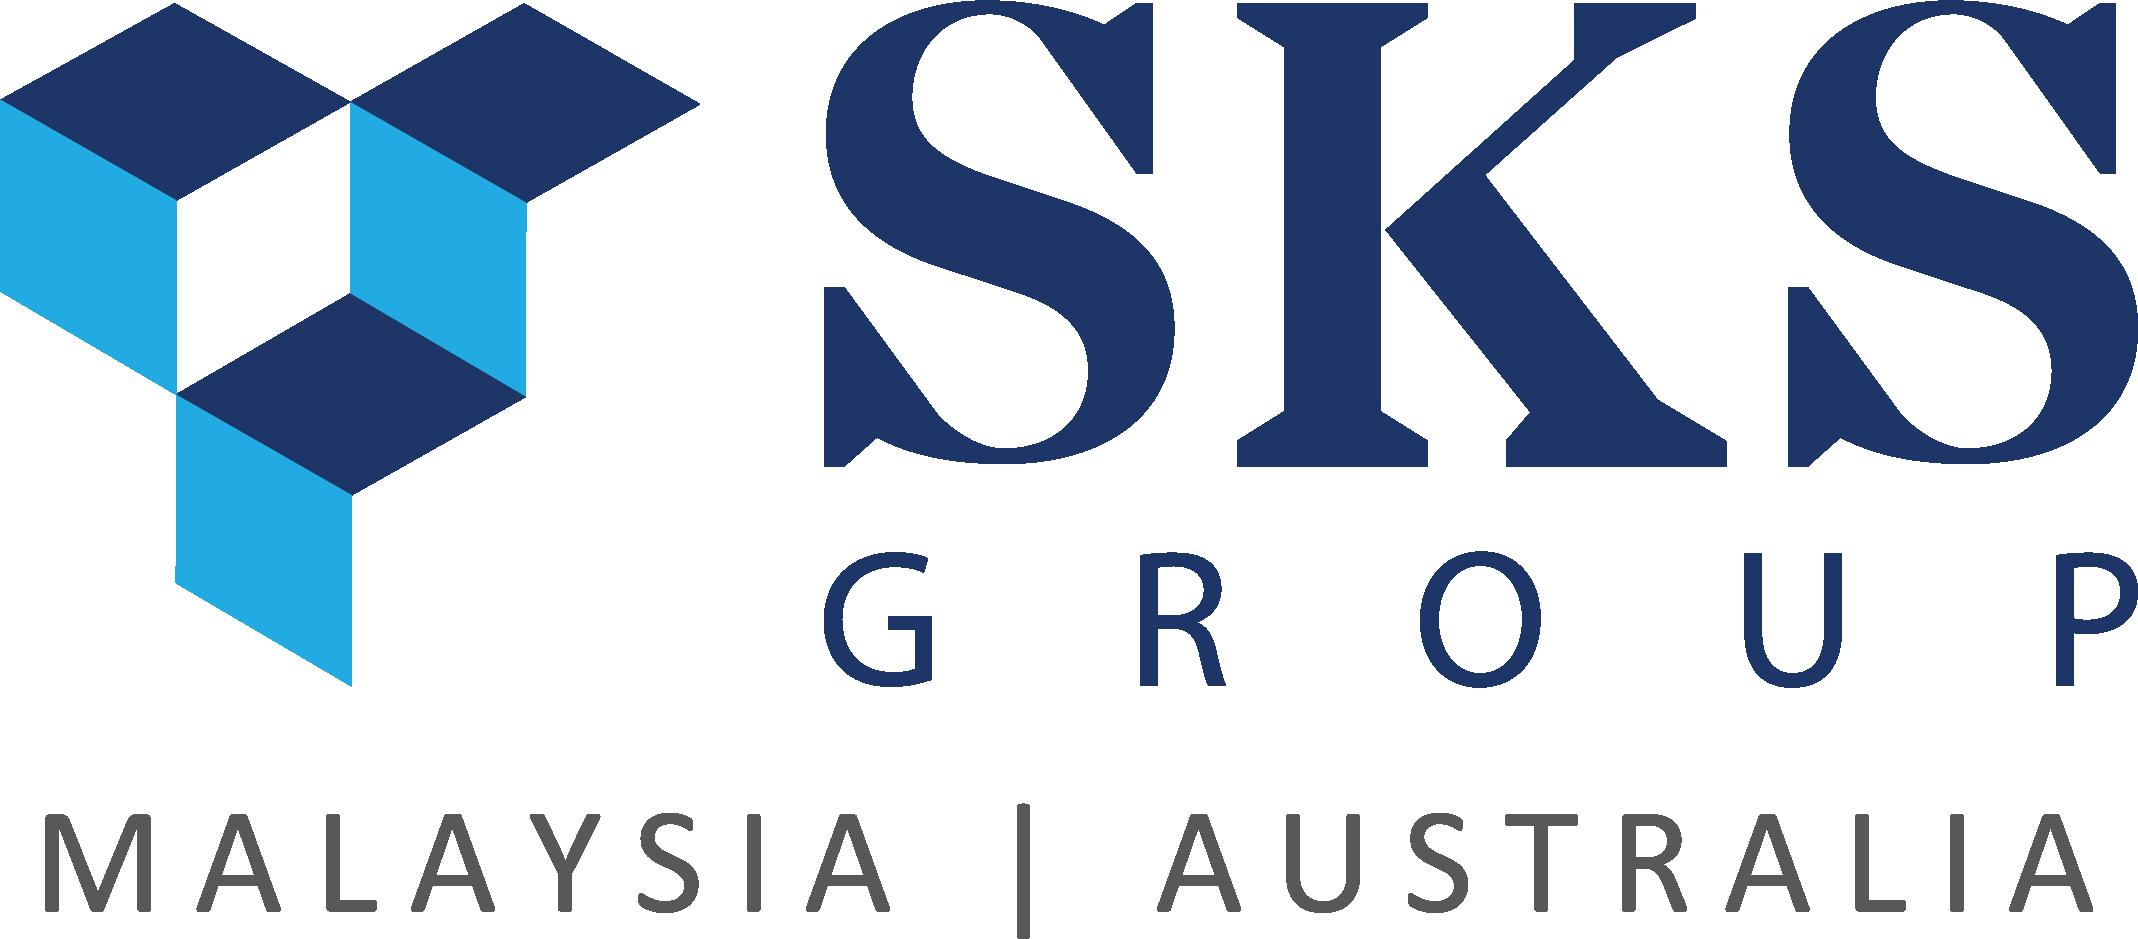 2_SKS-Group-MY-AU-RGB-on-white